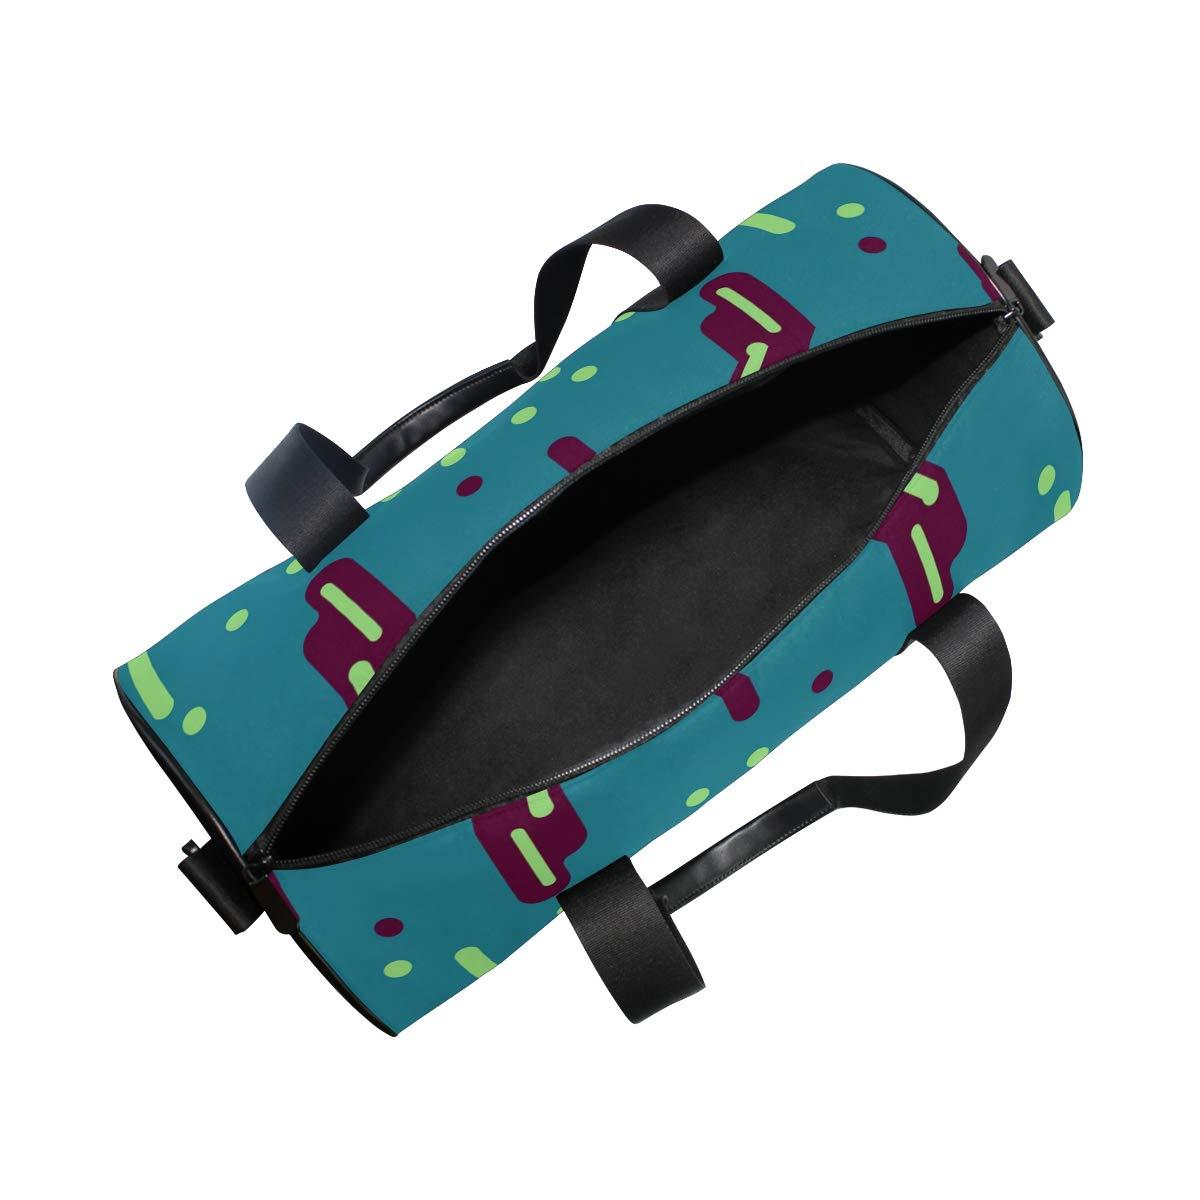 Raindrop Cyan StripWaterproof Non-Slip Wearable Crossbody Bag fitness bag Shoulder Bag